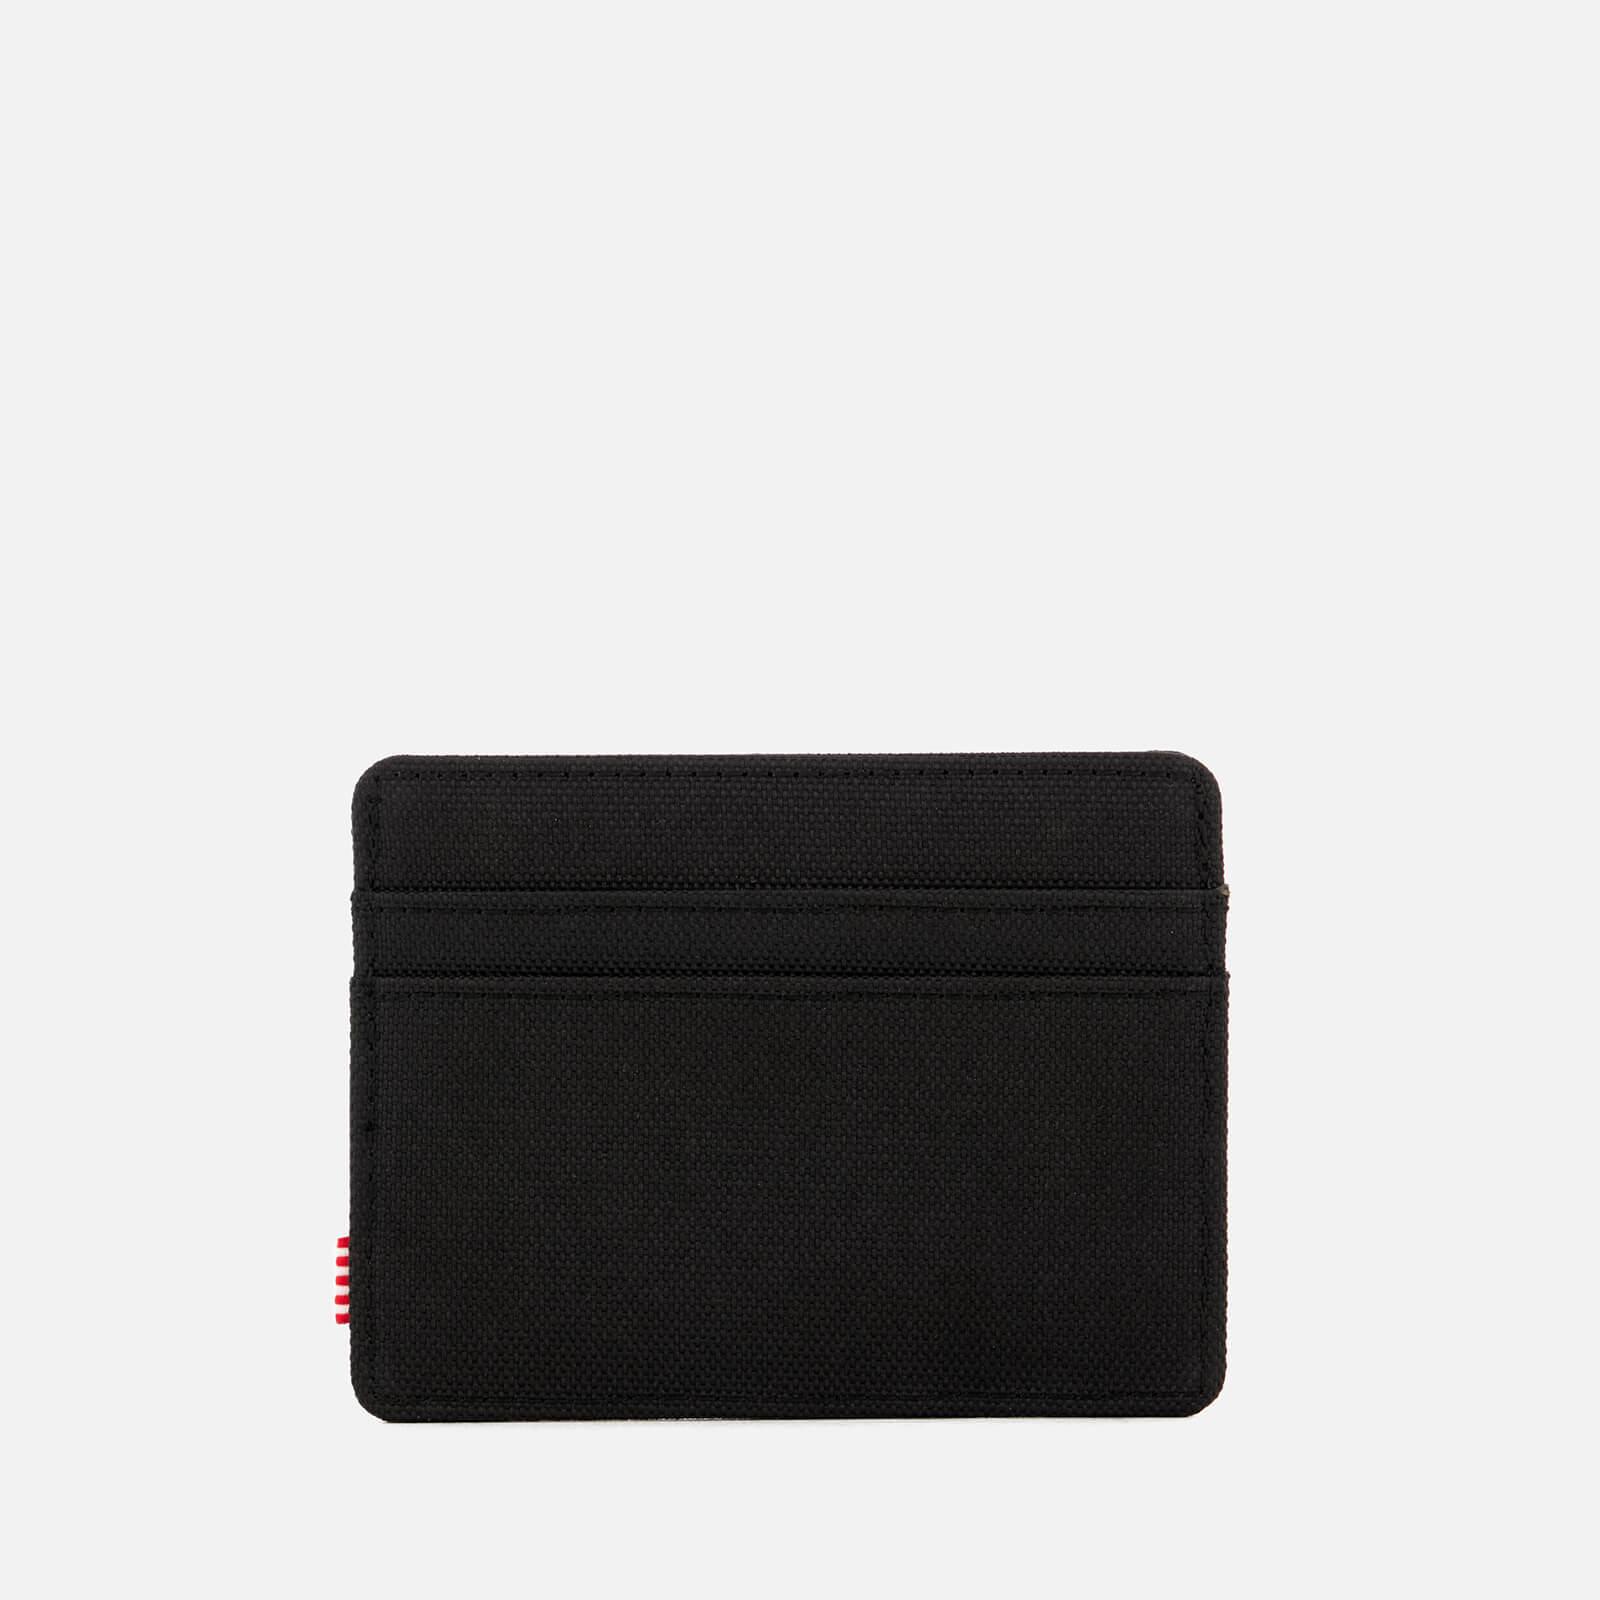 Herschel Supply Co. Men's Charlie Card Wallet - Black